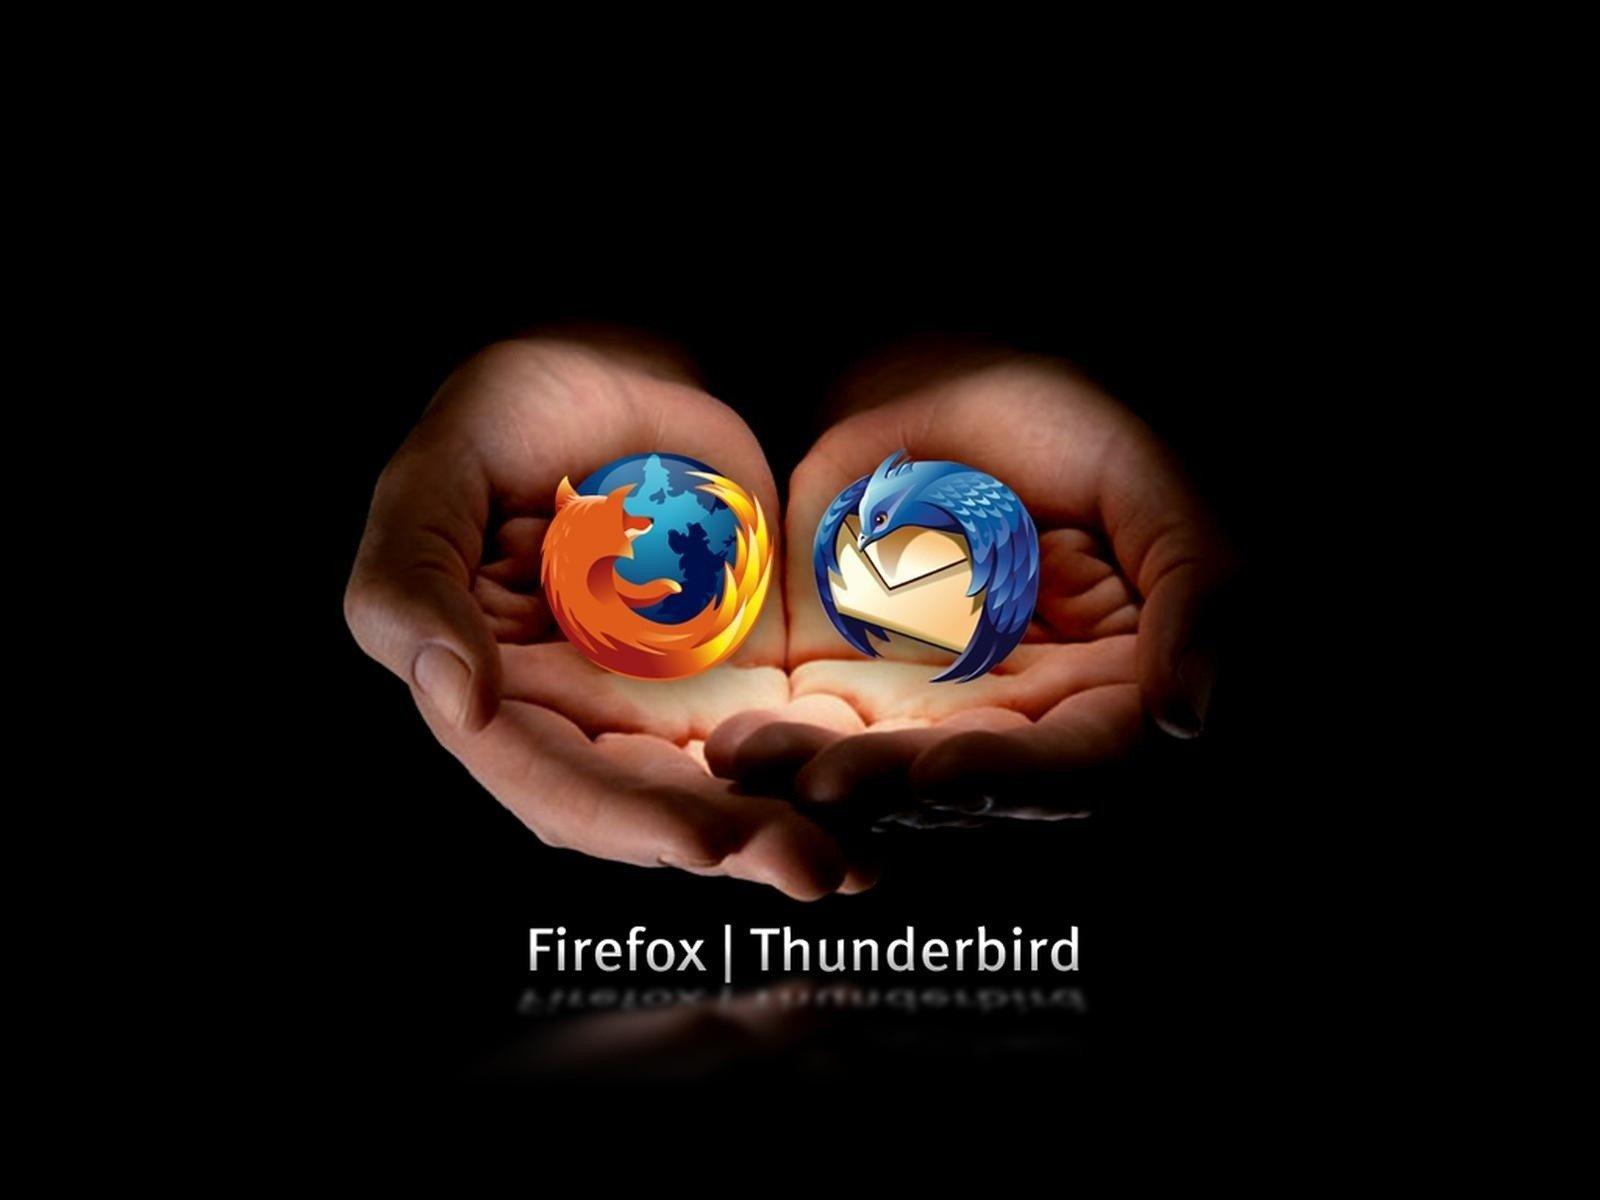 Mozilla Firefox, Logo, Open source, Browser, Dark, Fox, Thunderbird Wallpaper